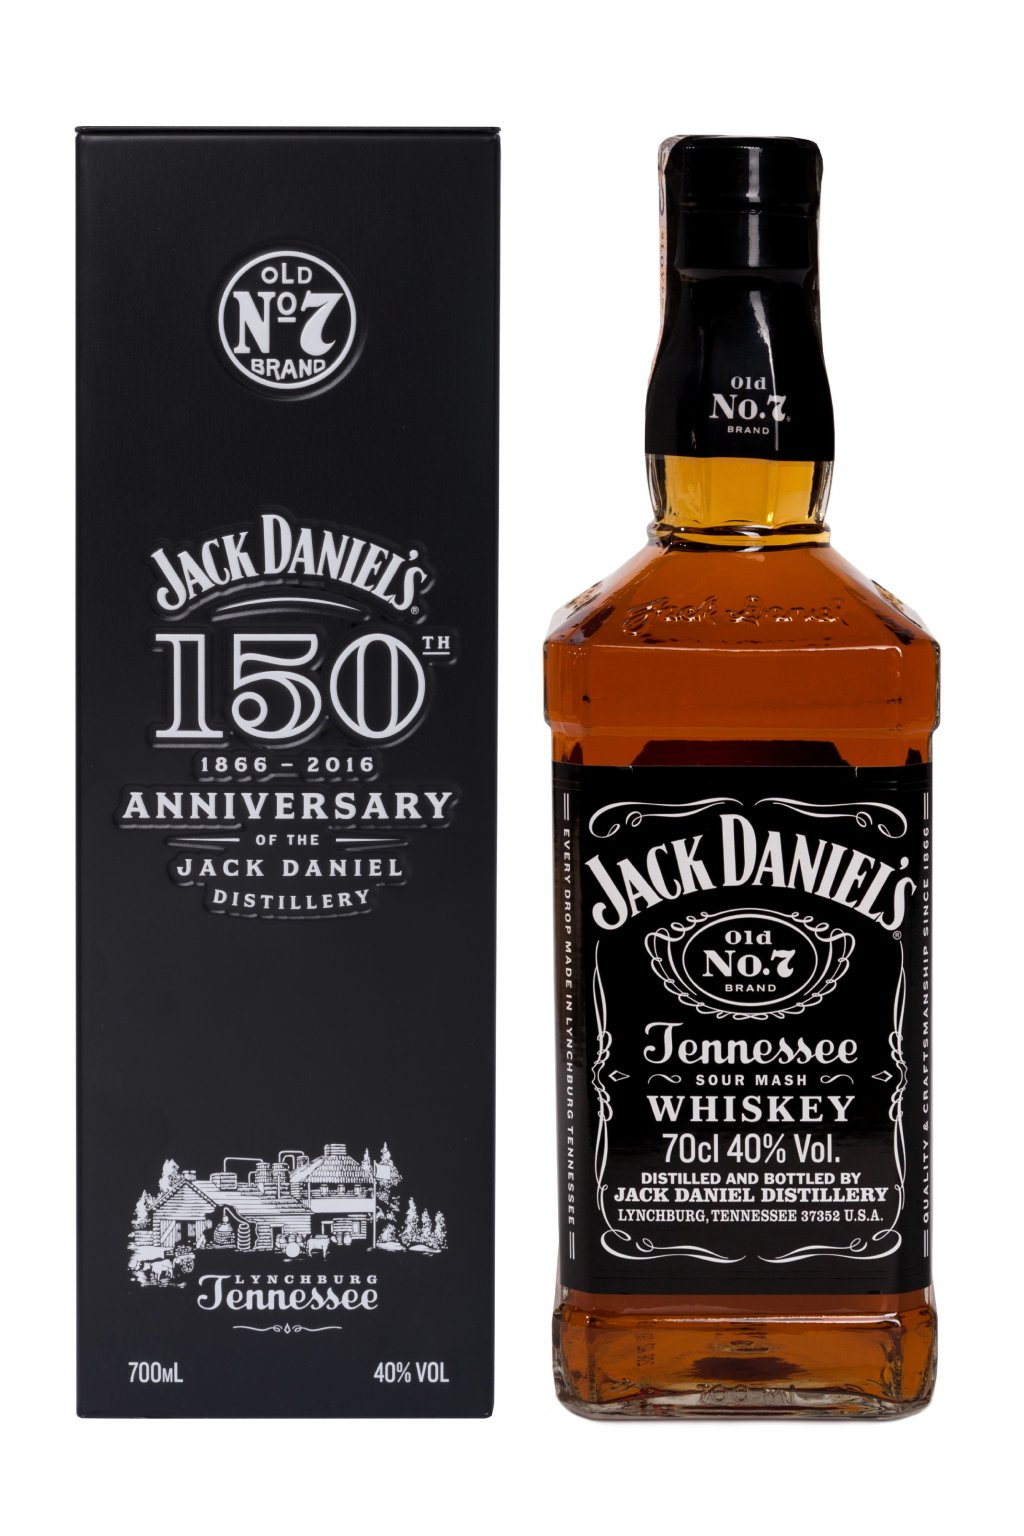 Jack Daniel's copy